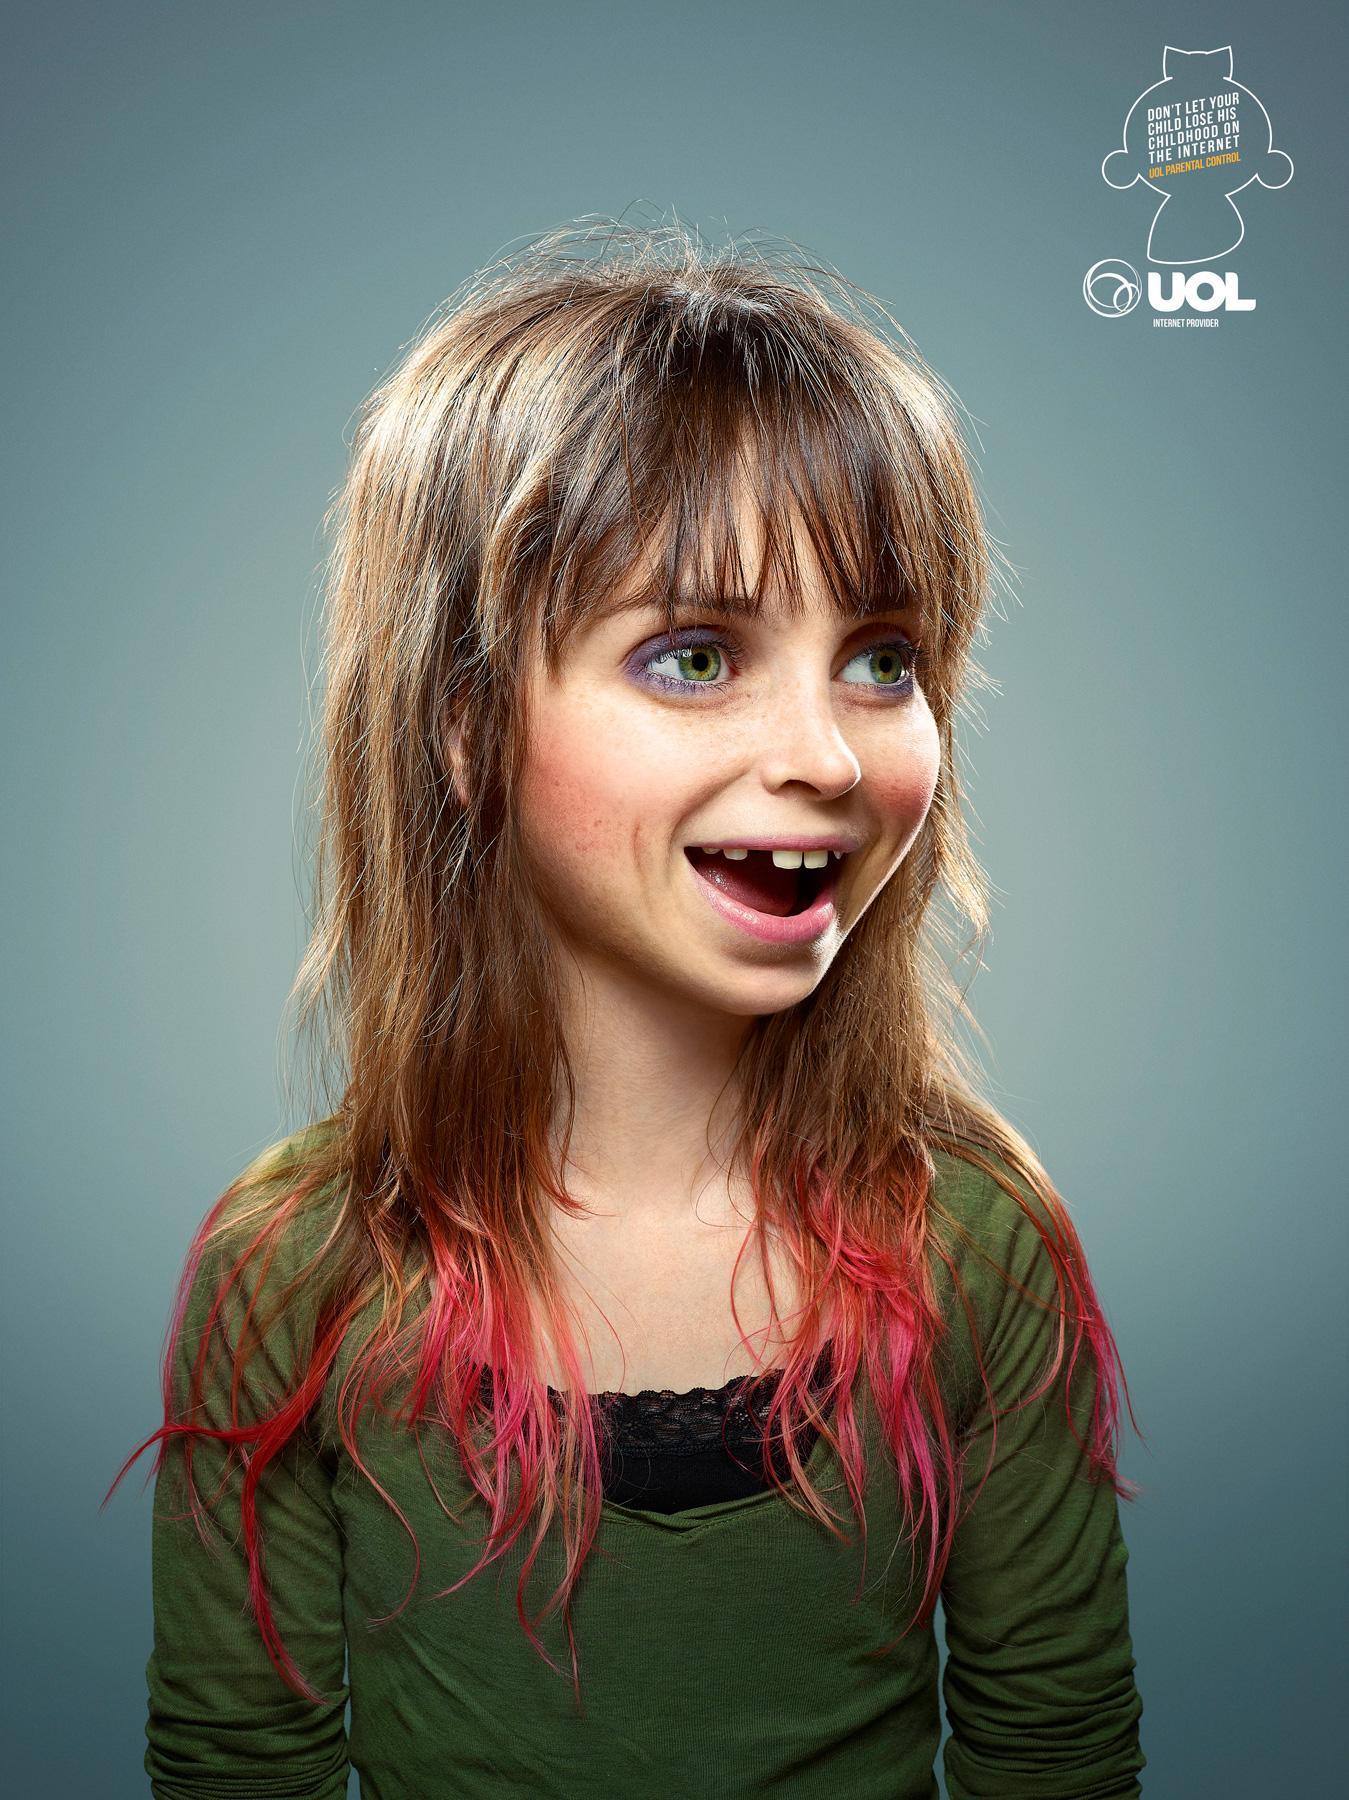 UOL Print Ad -  Childhood, 2